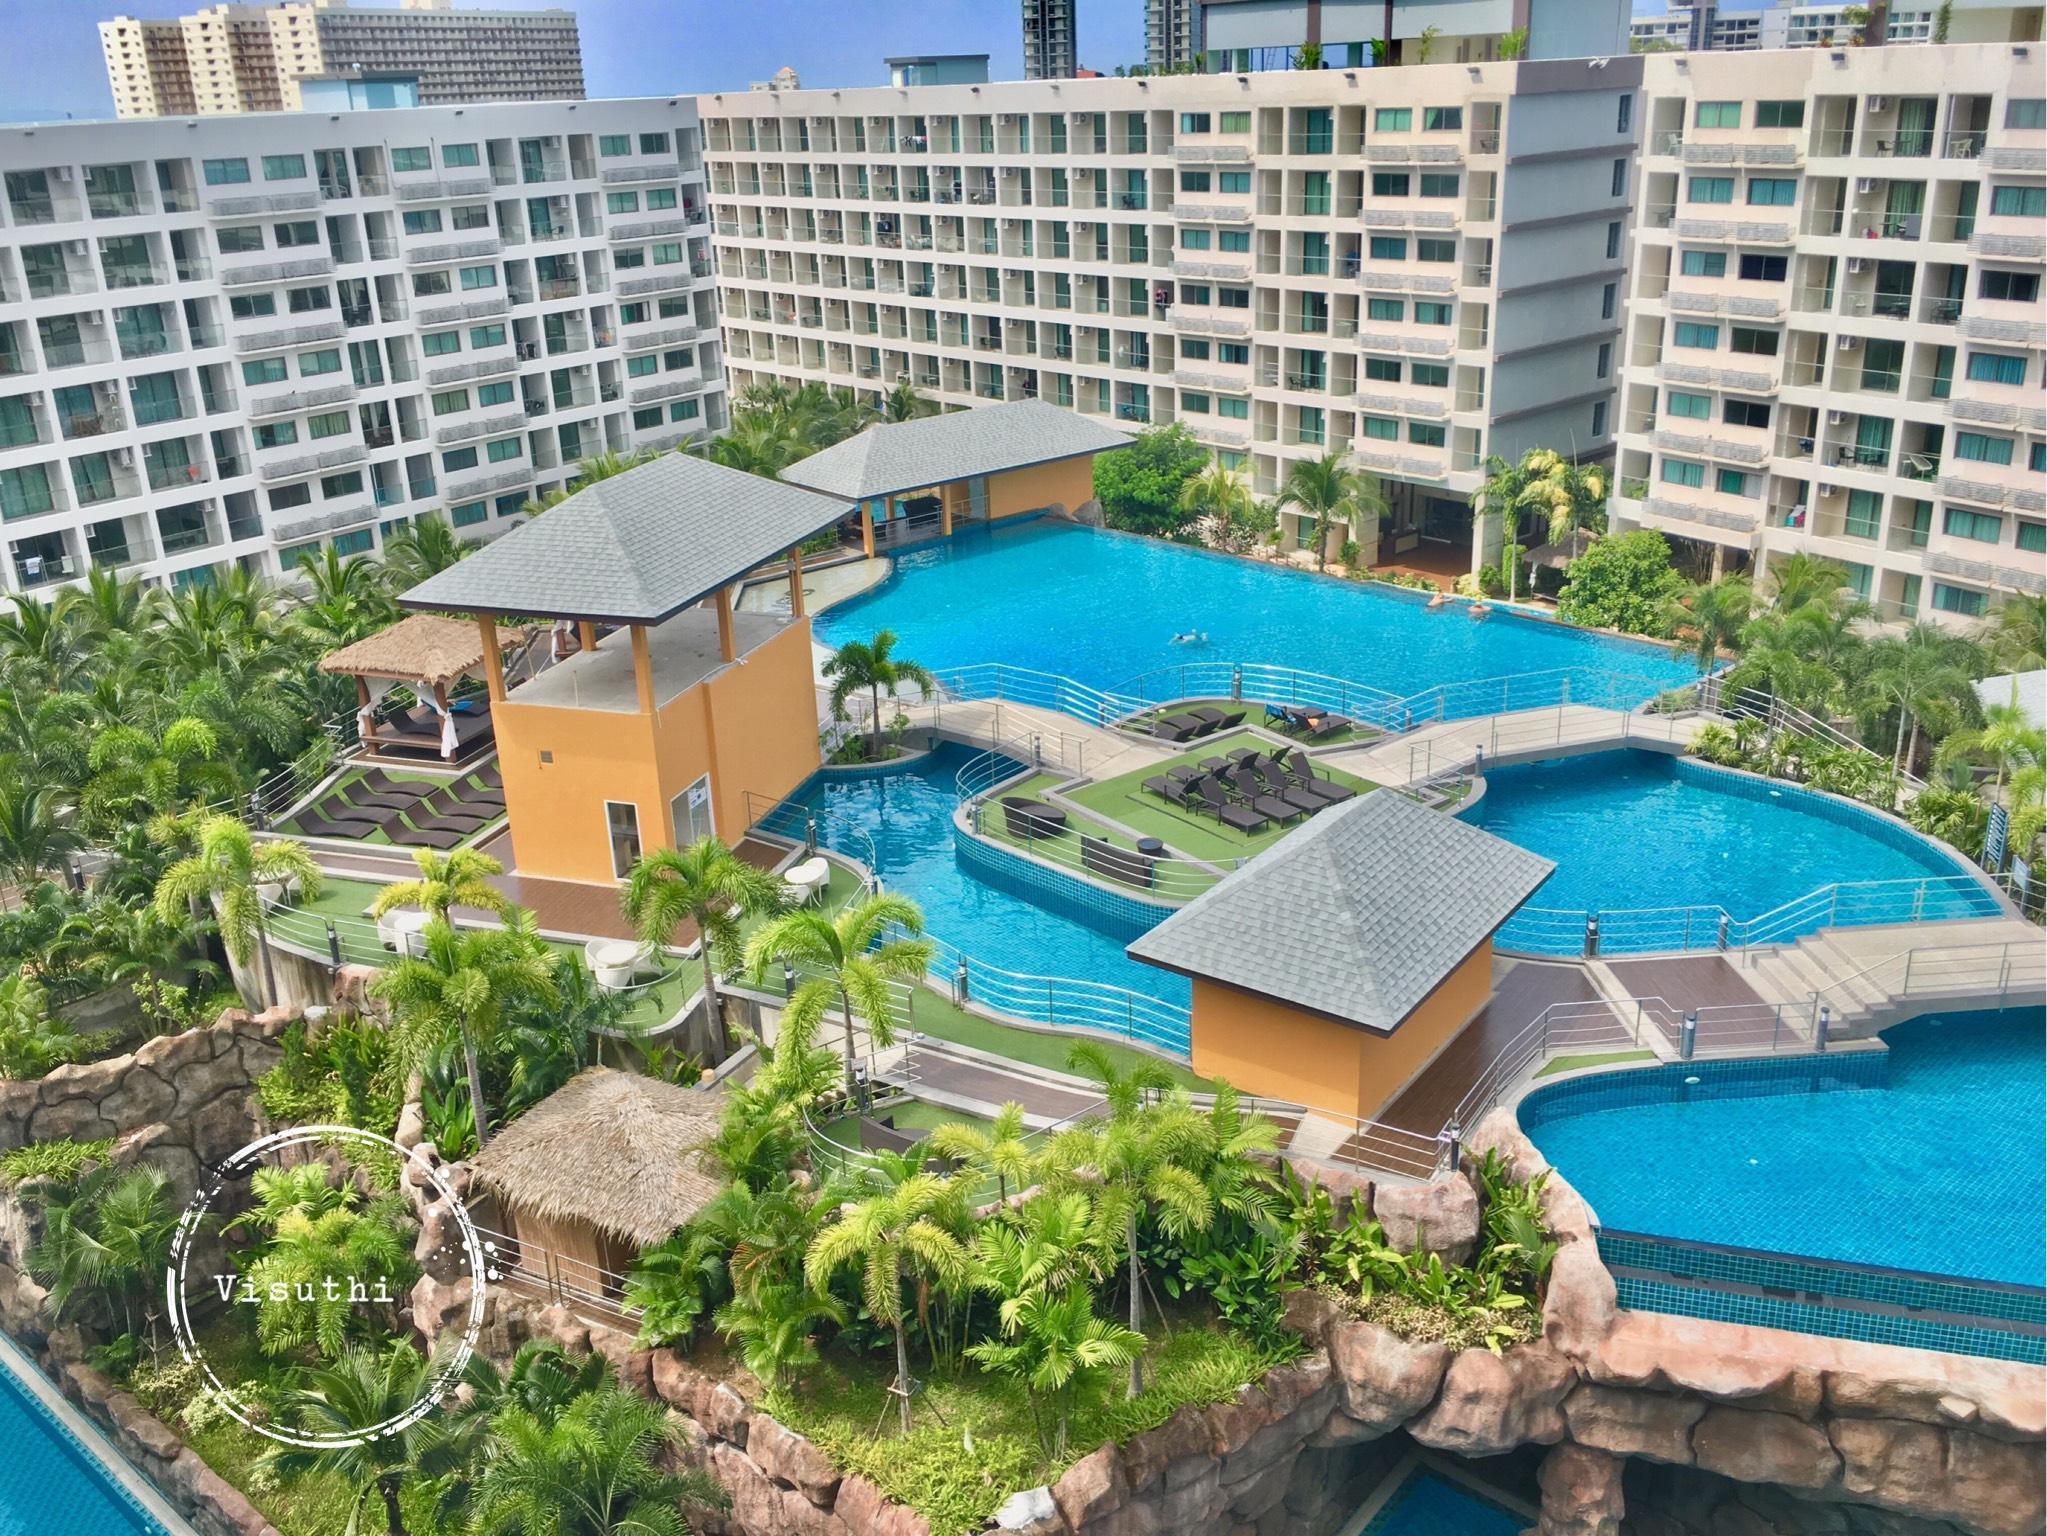 Pattaya Laguna Beach Resort 3 - The Maldive อพาร์ตเมนต์ 1 ห้องนอน 1 ห้องน้ำส่วนตัว ขนาด 28 ตร.ม. – หาดจอมเทียน